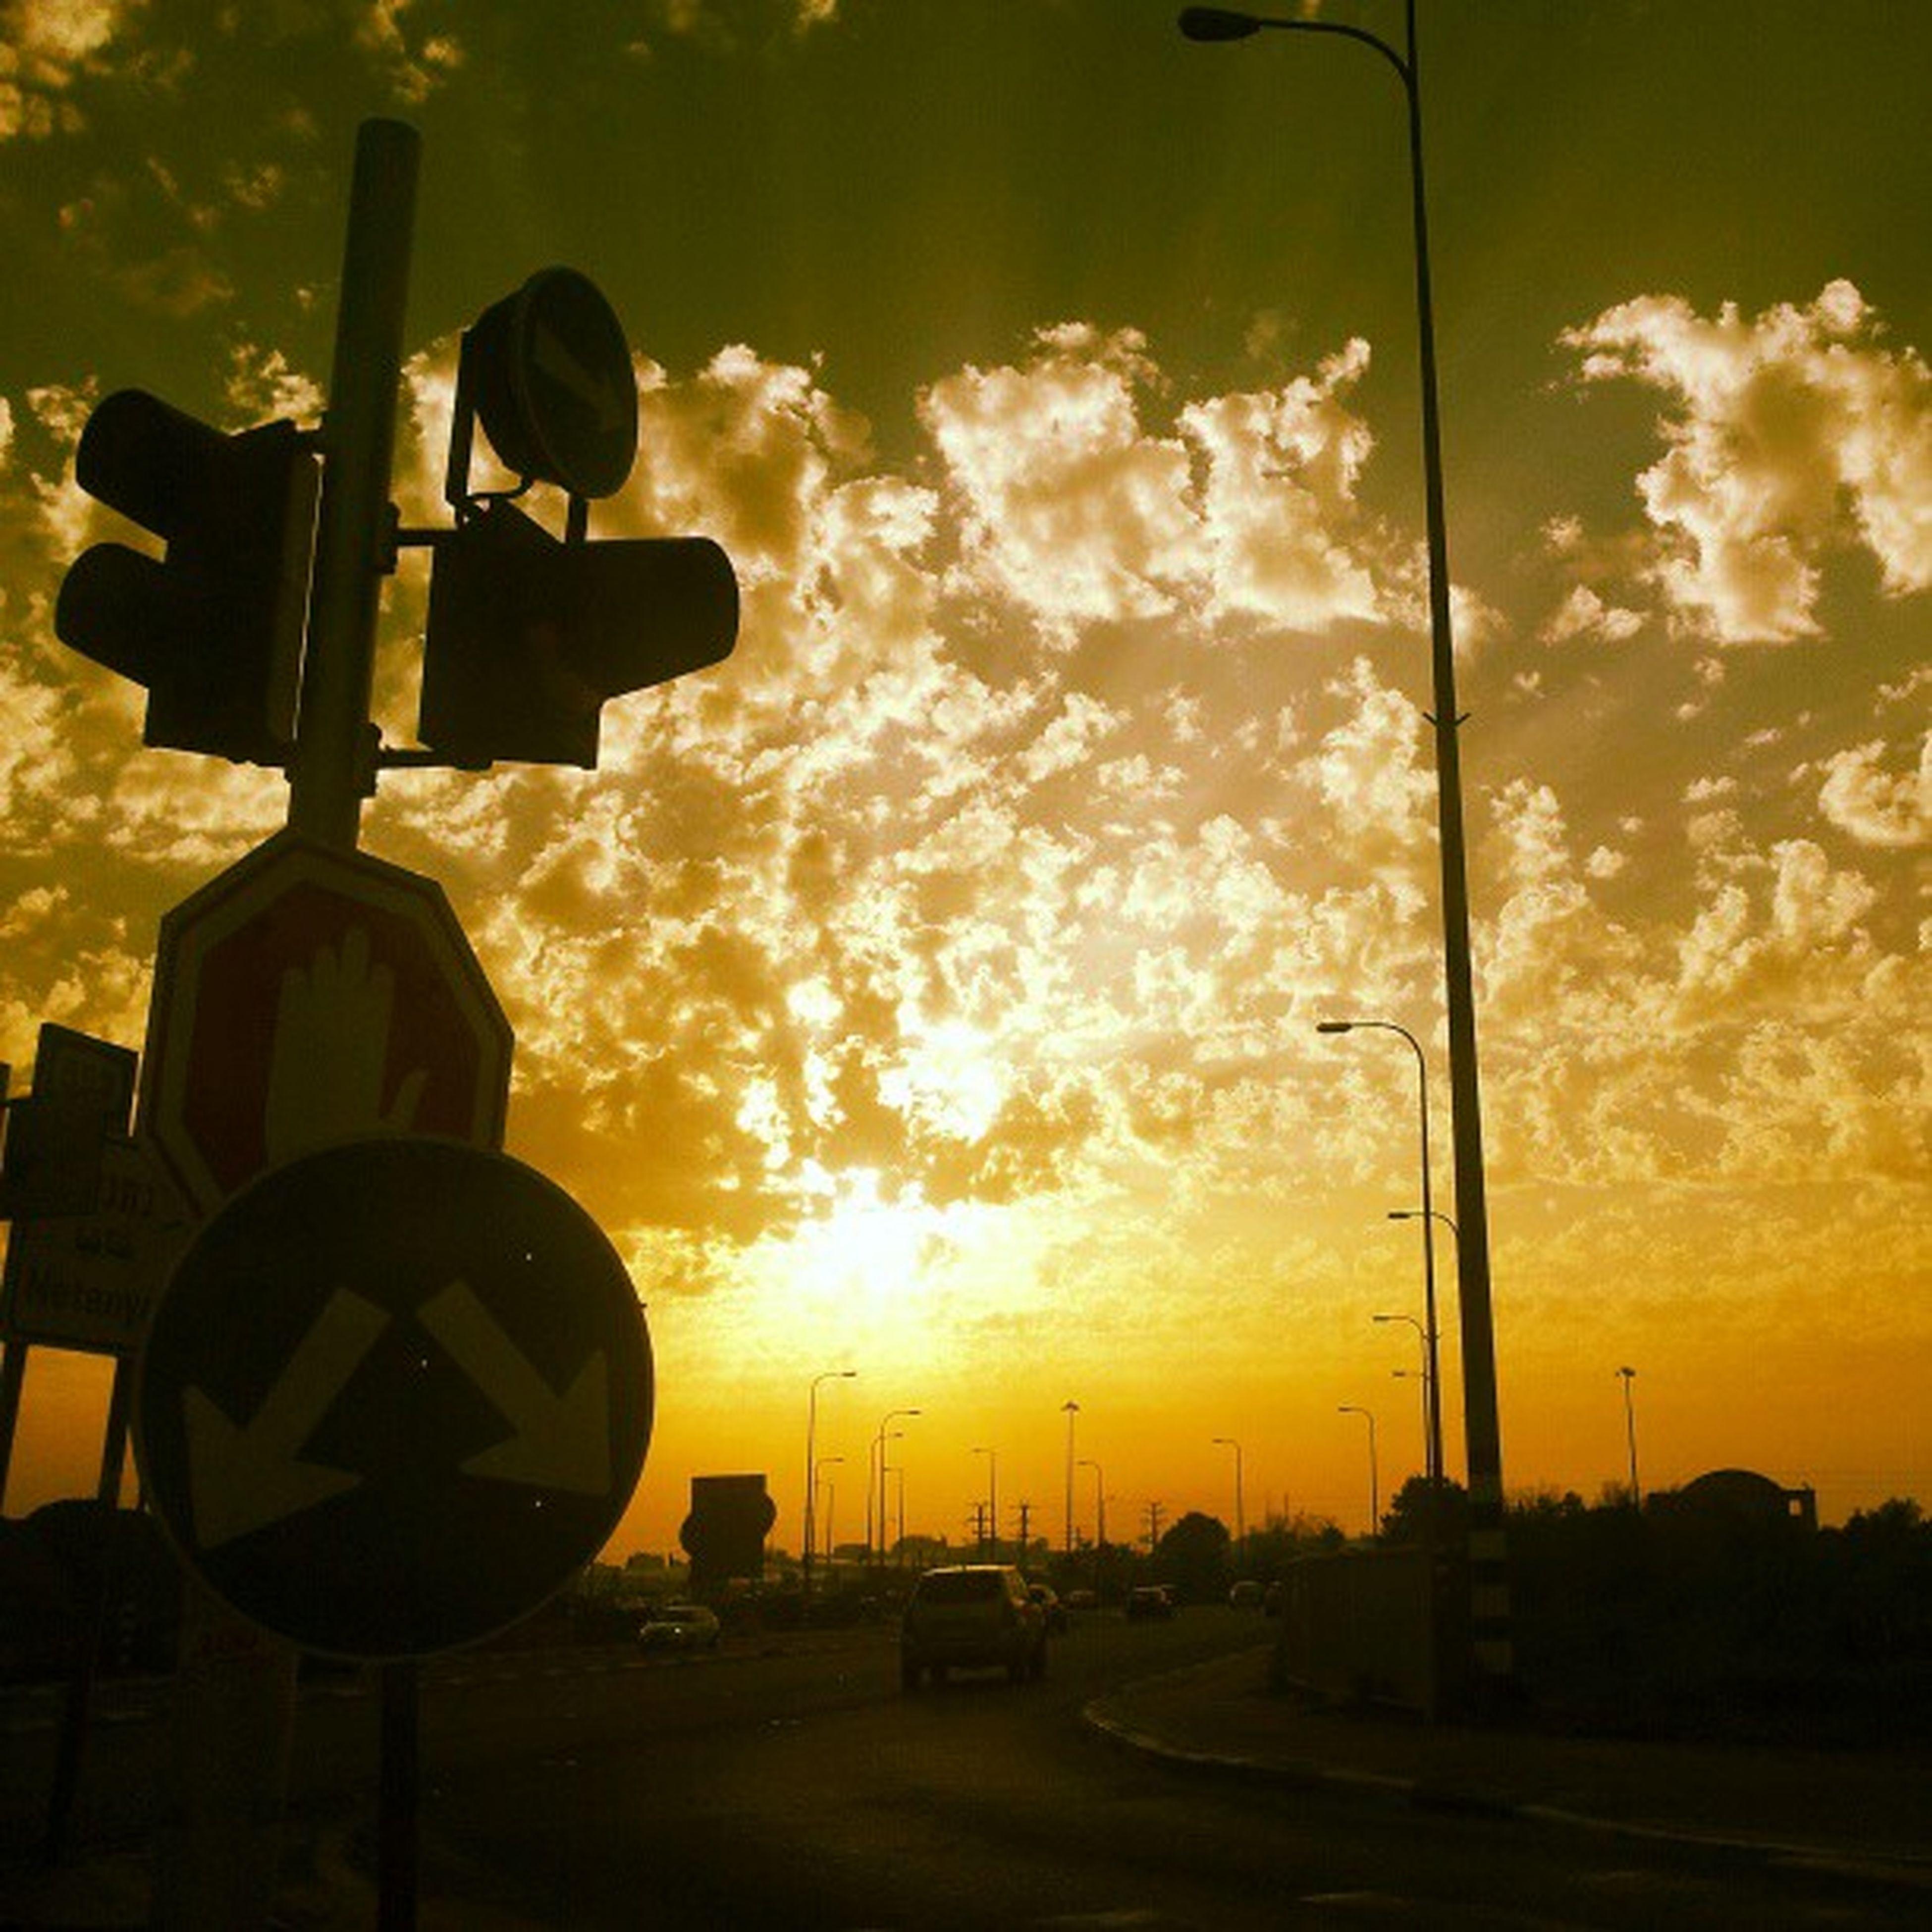 sunset, street light, sky, orange color, silhouette, lighting equipment, cloud - sky, car, sun, land vehicle, transportation, yellow, street, outdoors, nature, illuminated, no people, sunlight, mode of transport, beauty in nature